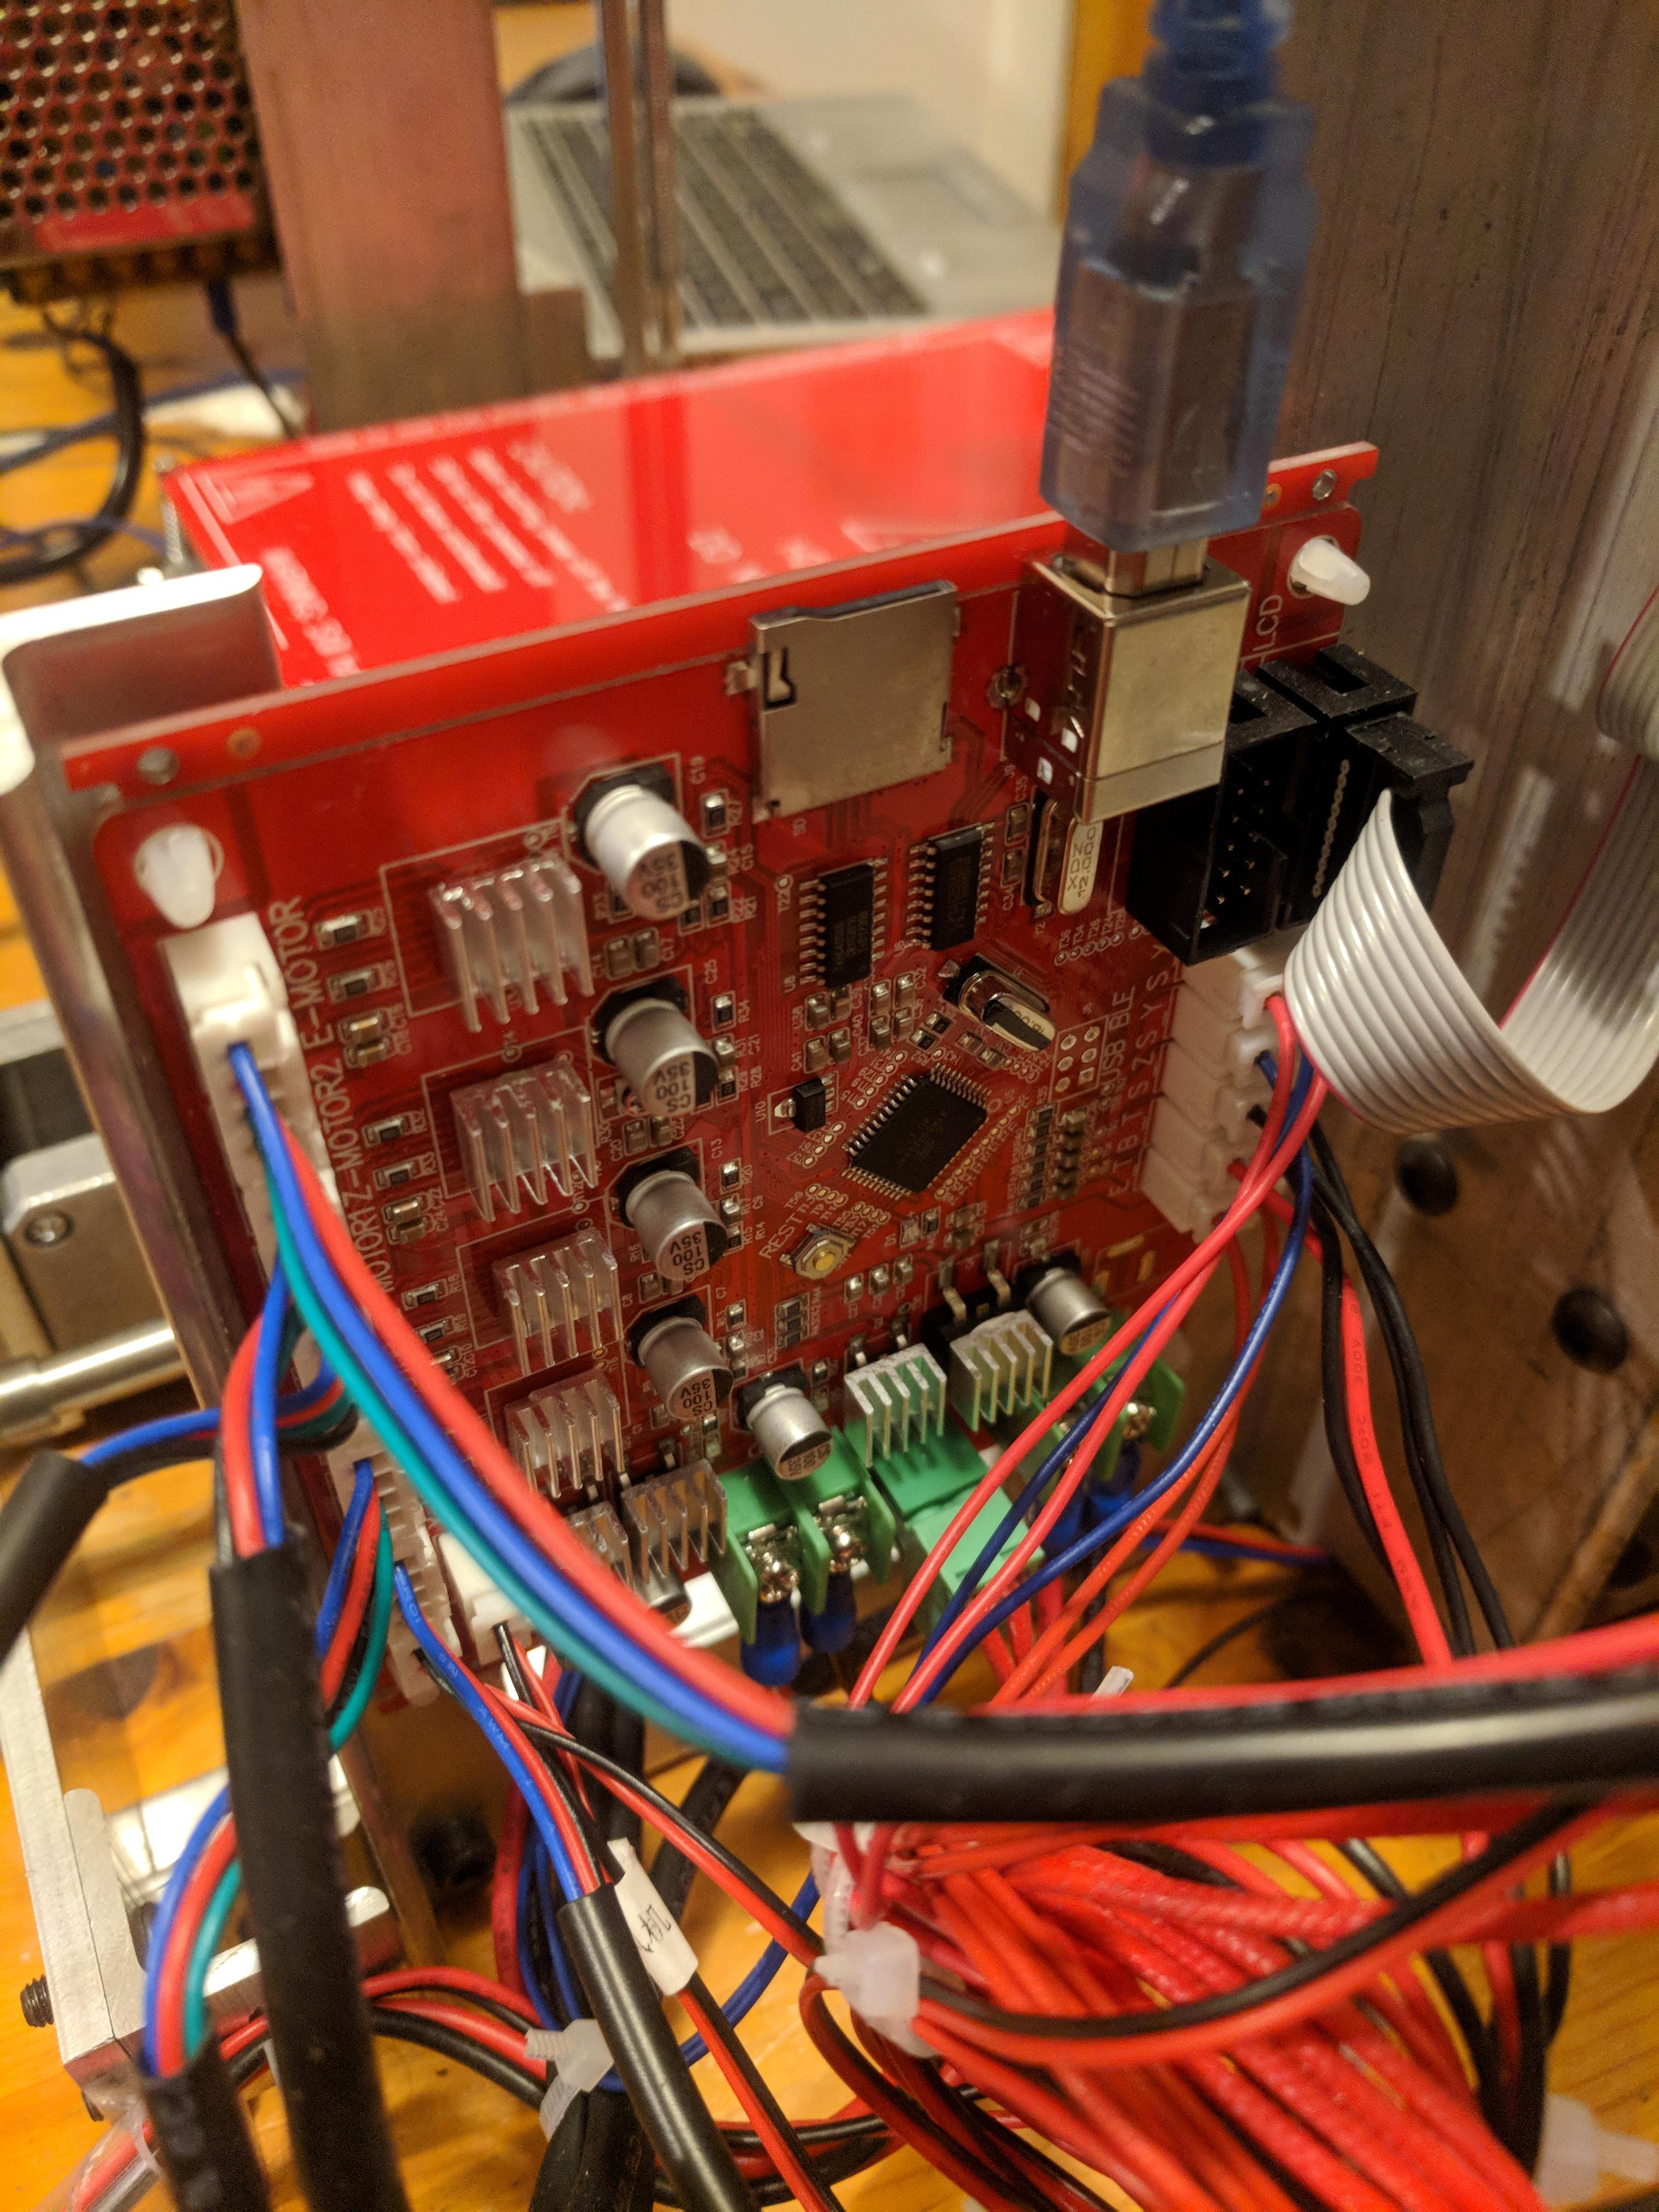 Marlin Anet A8 Board Upload Errors 3d Printers Talk Usbasp Usb Programmer For Atmel Avr Controllers Nexuscyber Img 20180524 0130153036x4048 383 Mb